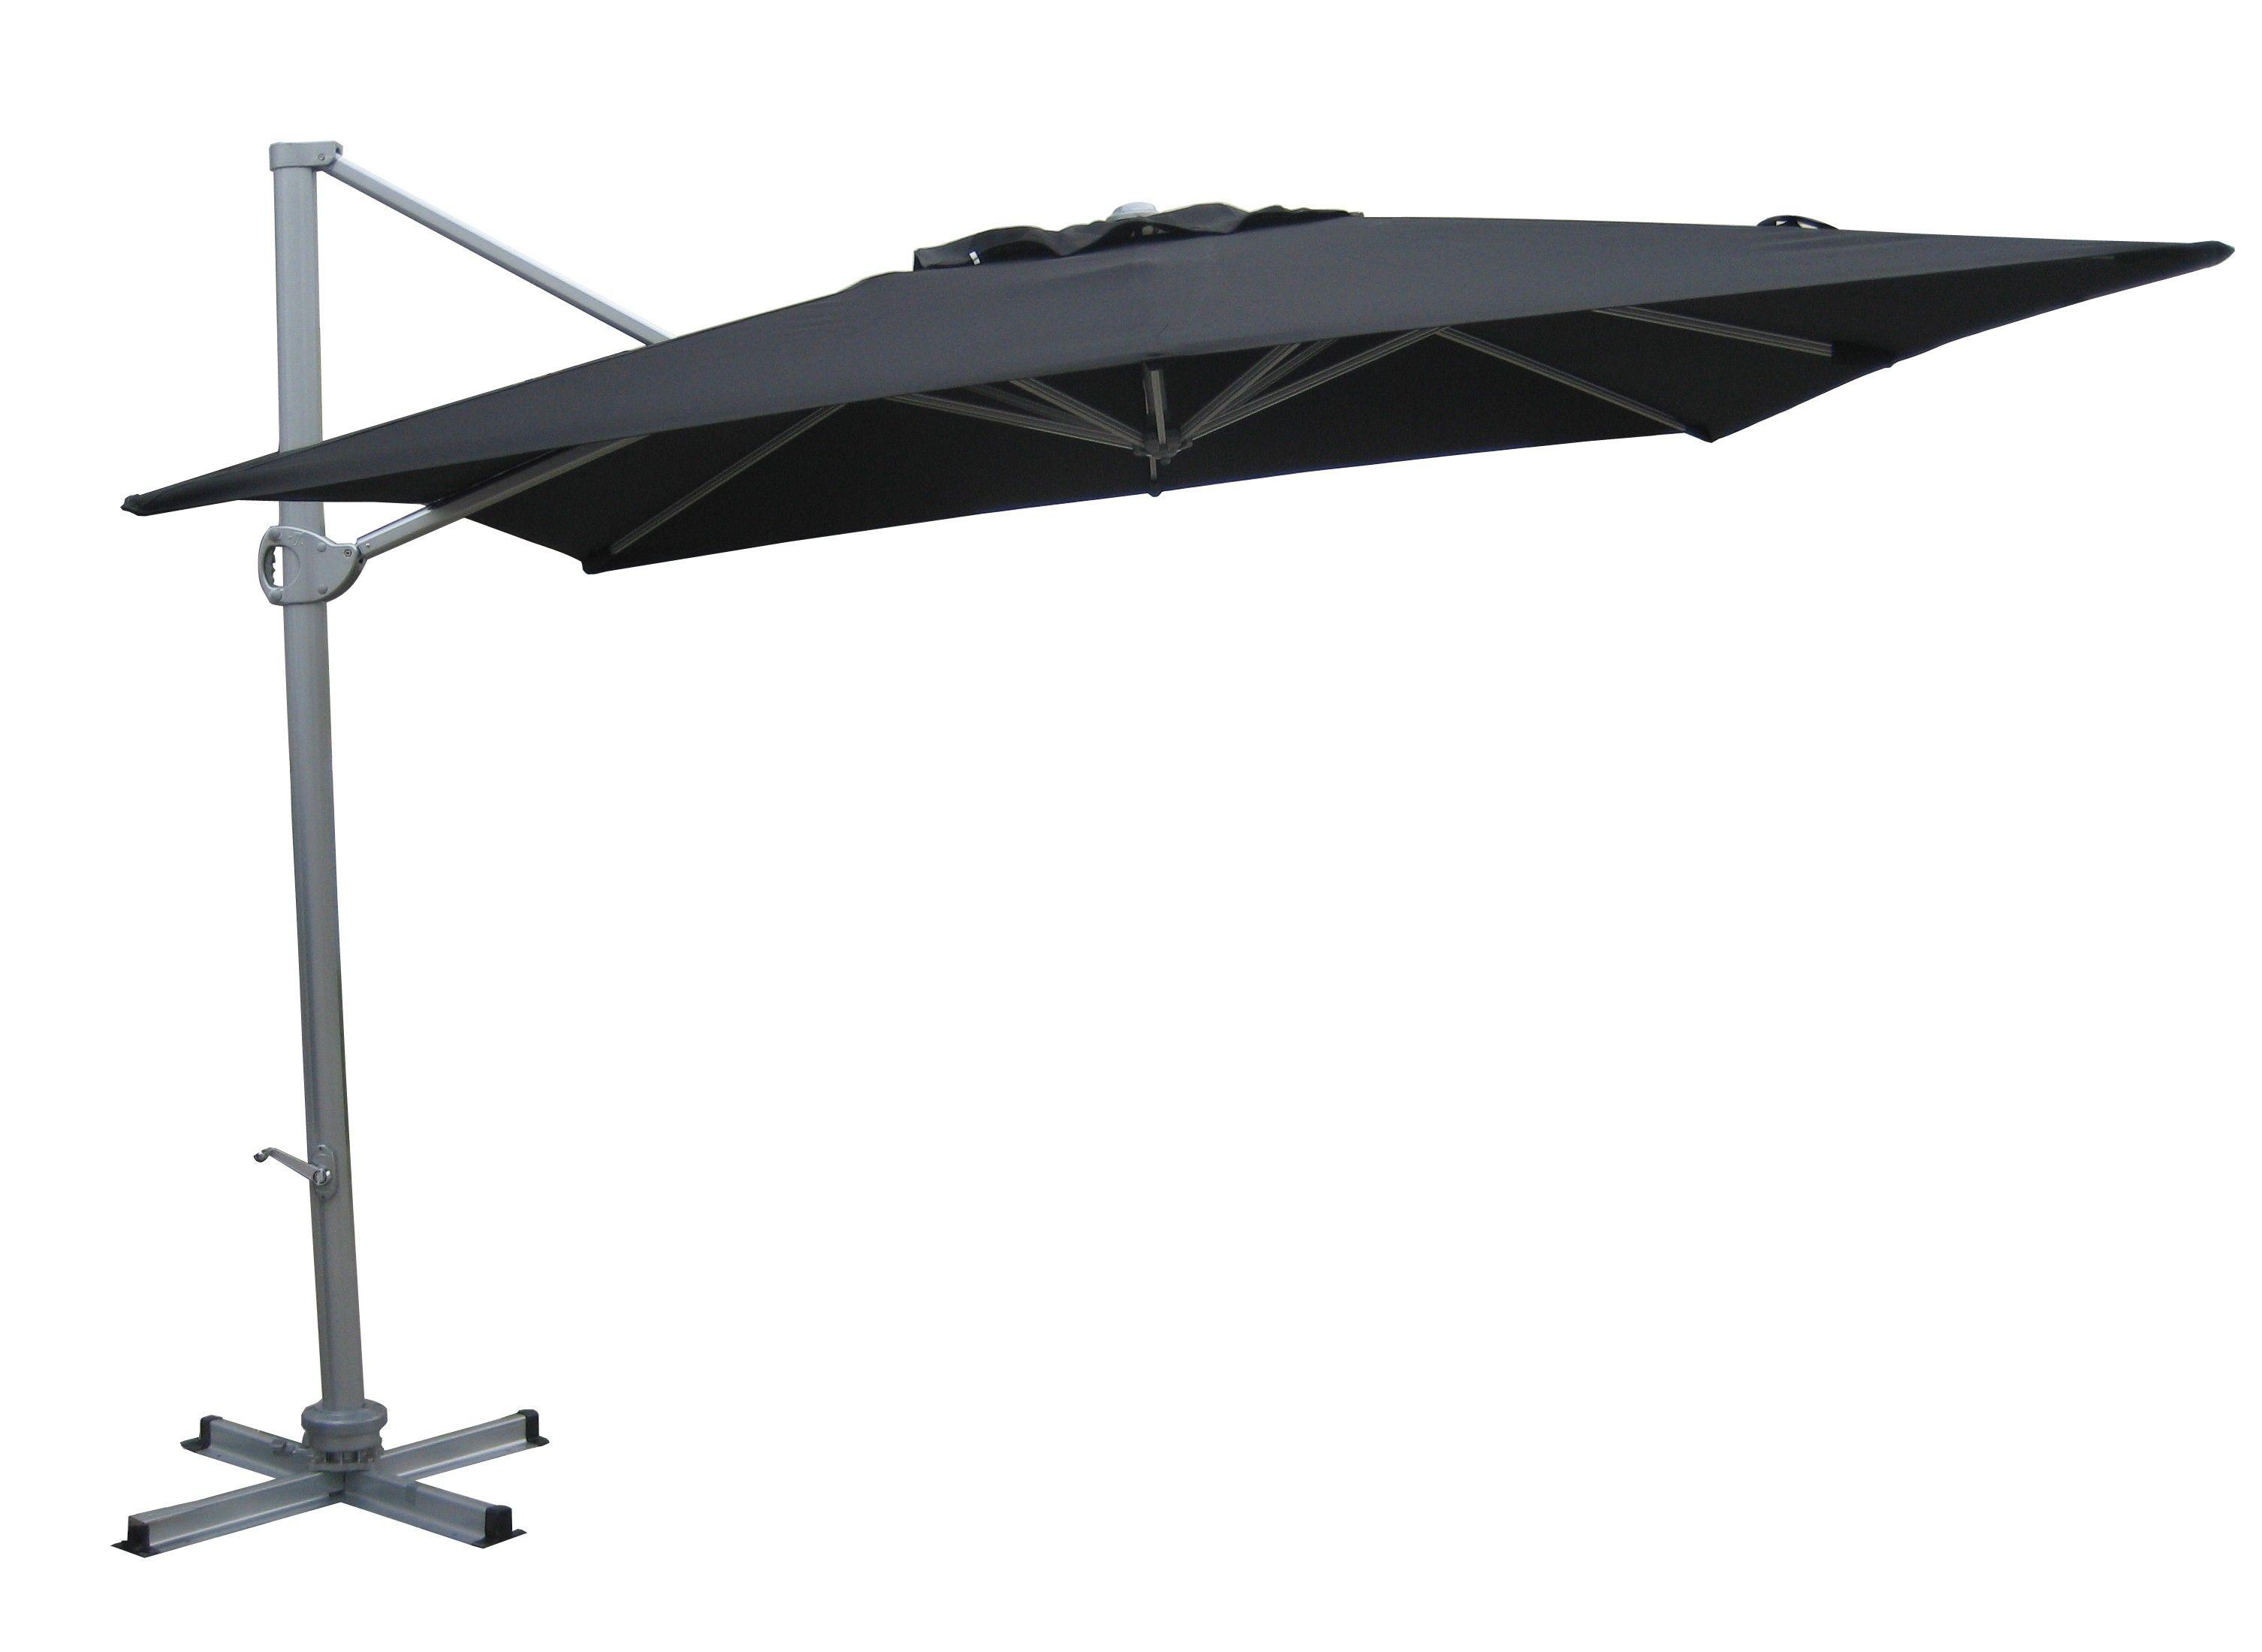 Aluminium cantilever outdoor umbrella 3 x 3m square for Ikea cantilever umbrella